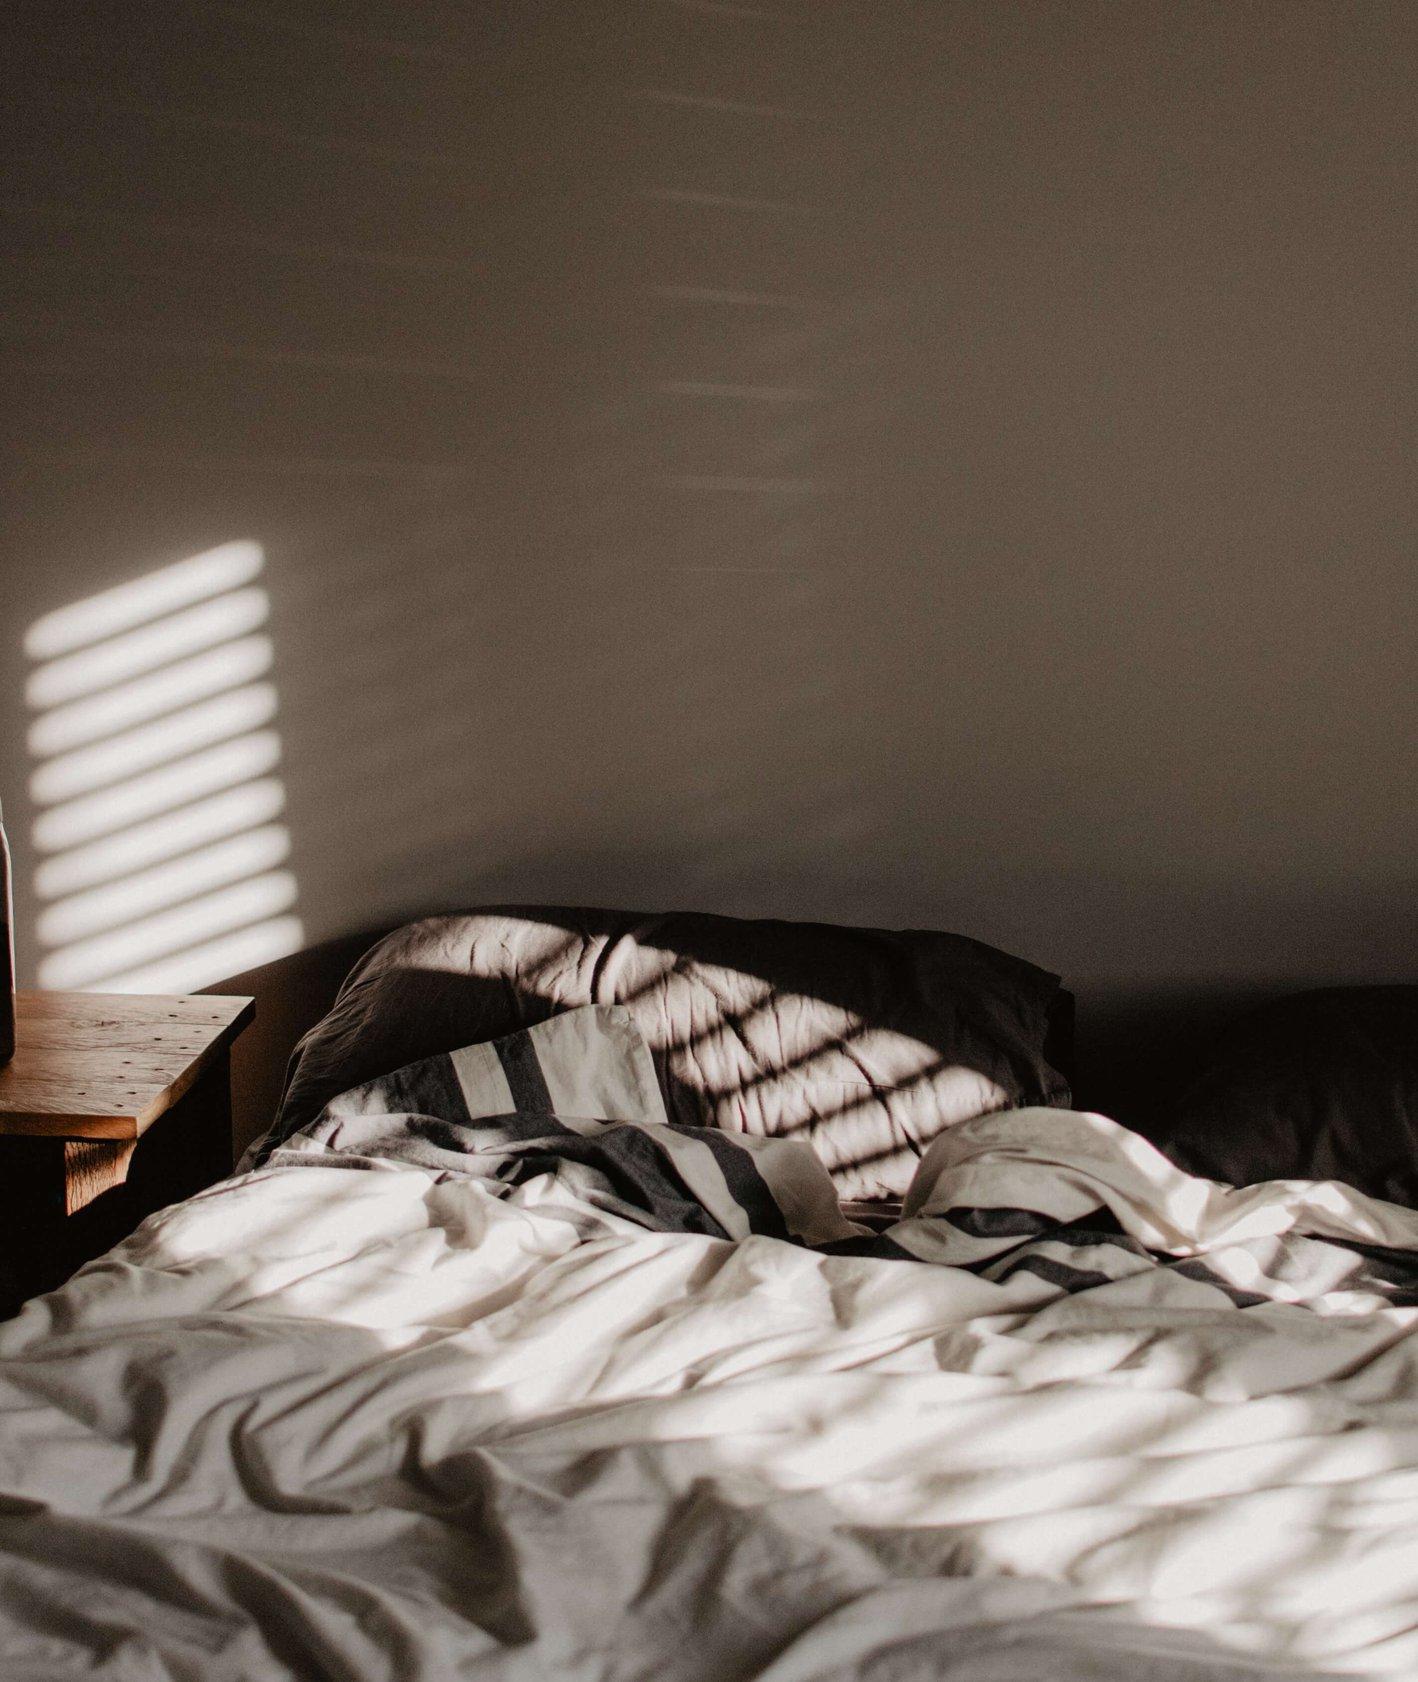 Puste łóżko (fot. Becca Schultz / unsplash.com)